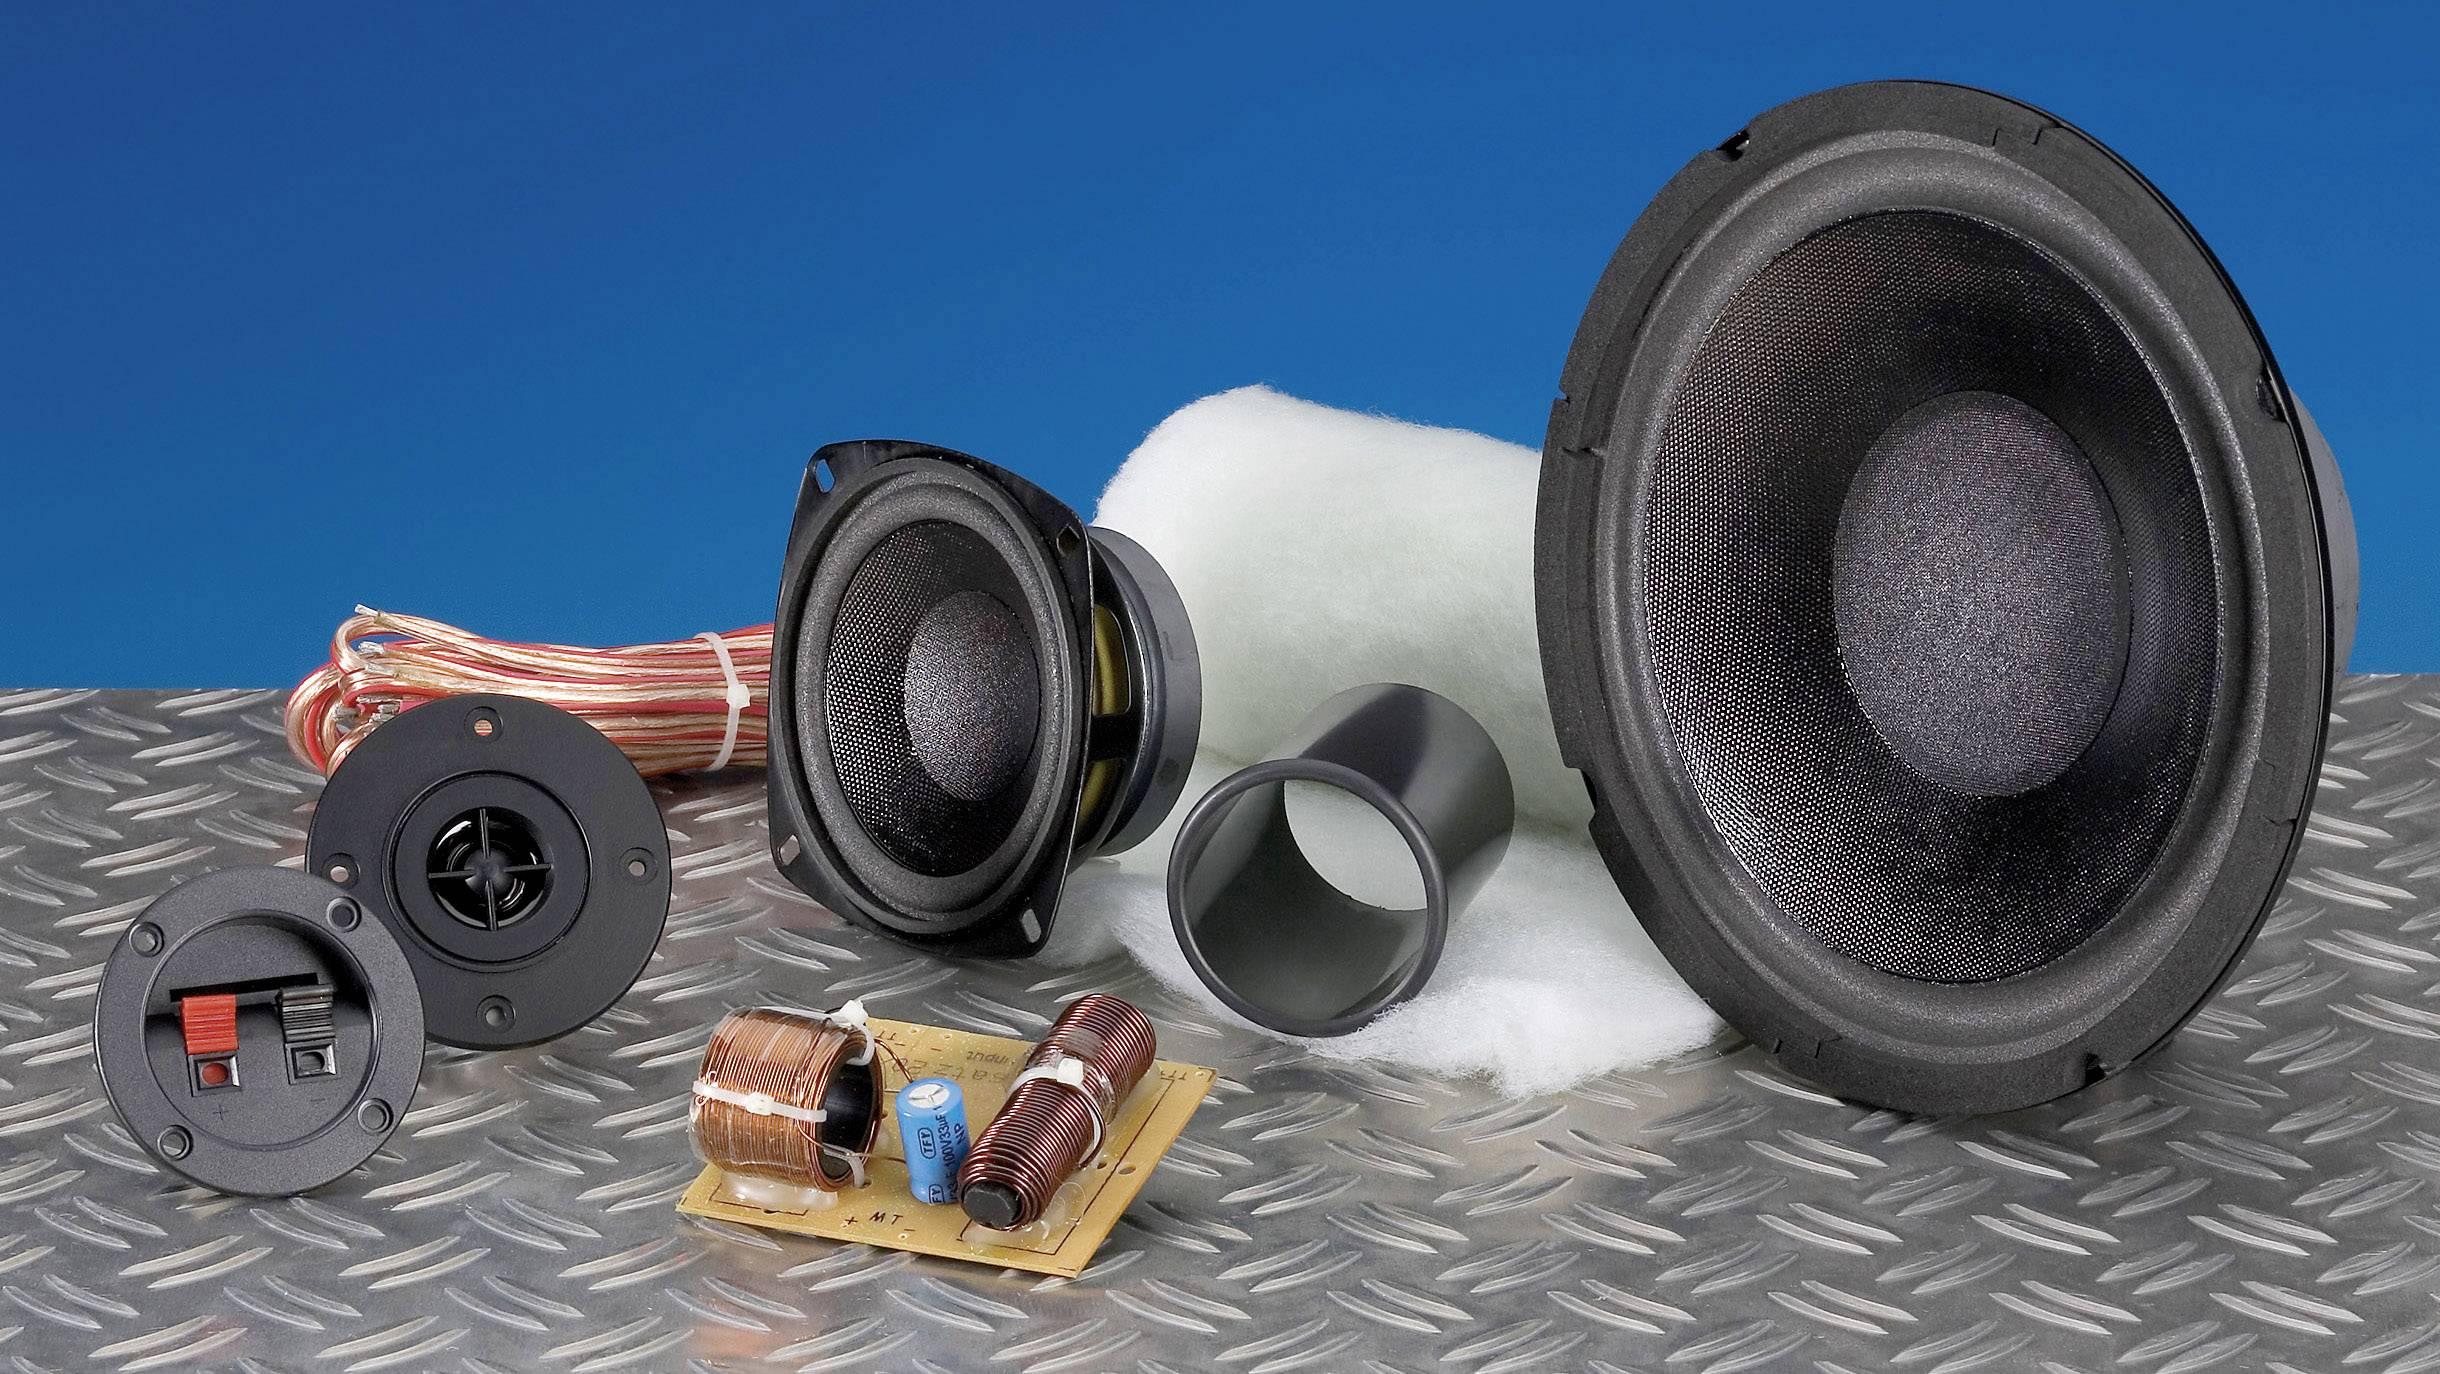 Reproduktor SpeaKa 10/60 W, 8 Ω, 87 dB